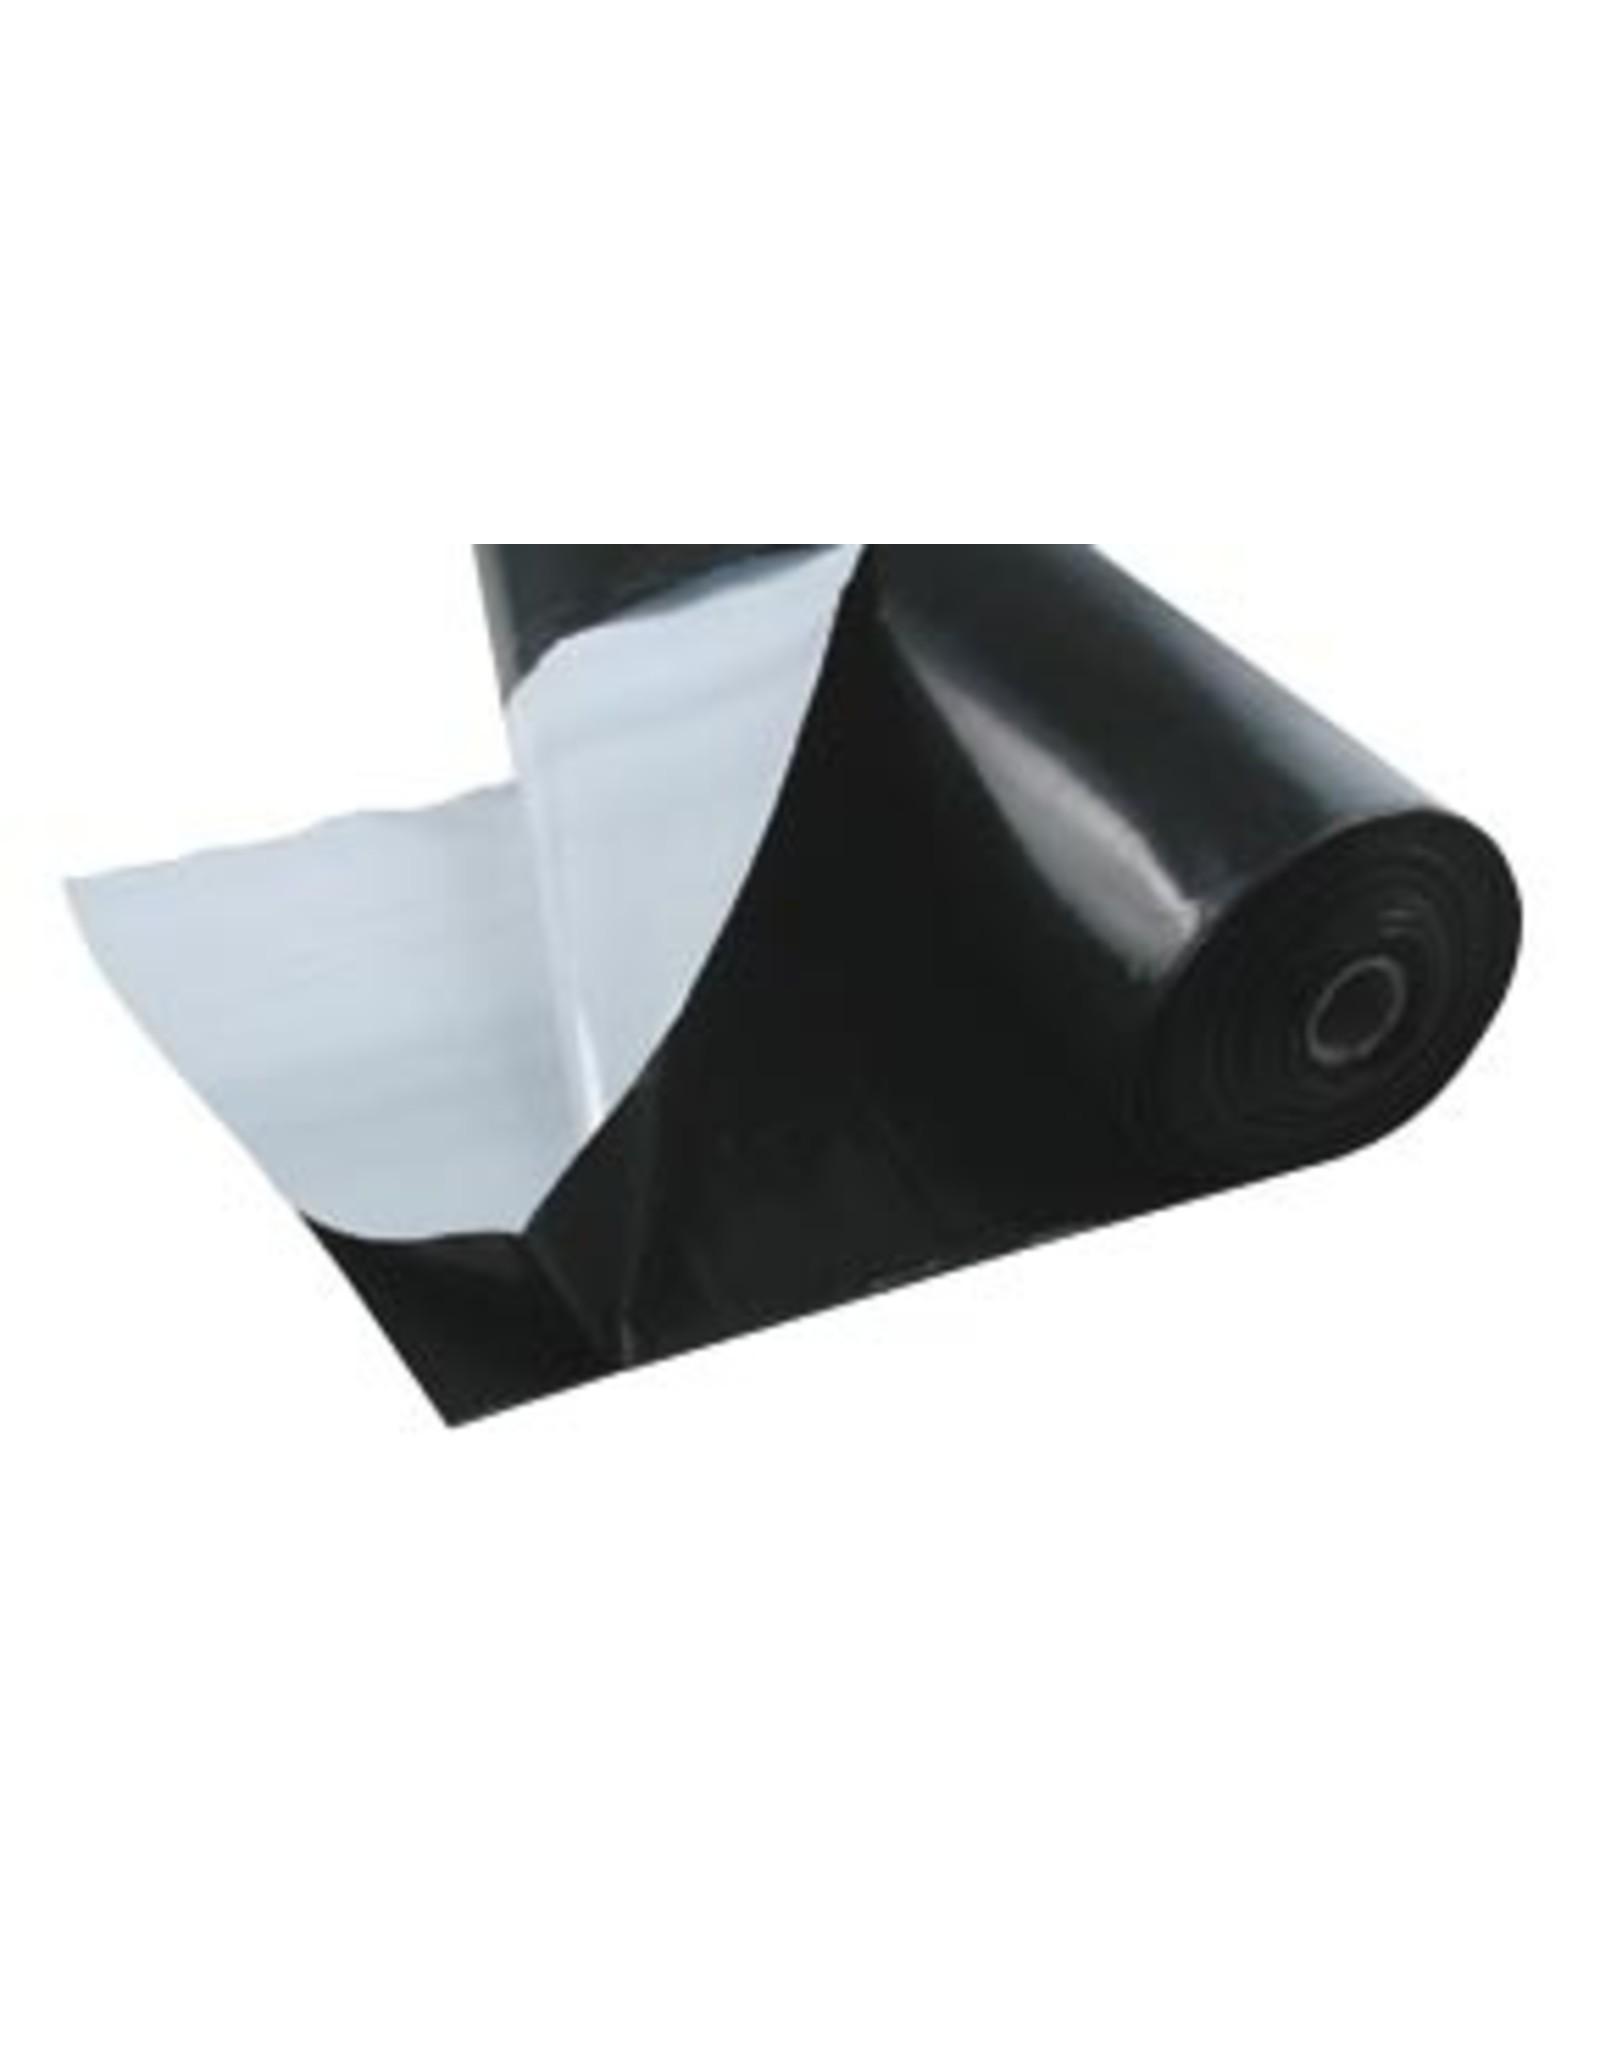 Black & White Plastic 10' X 10' Sheet